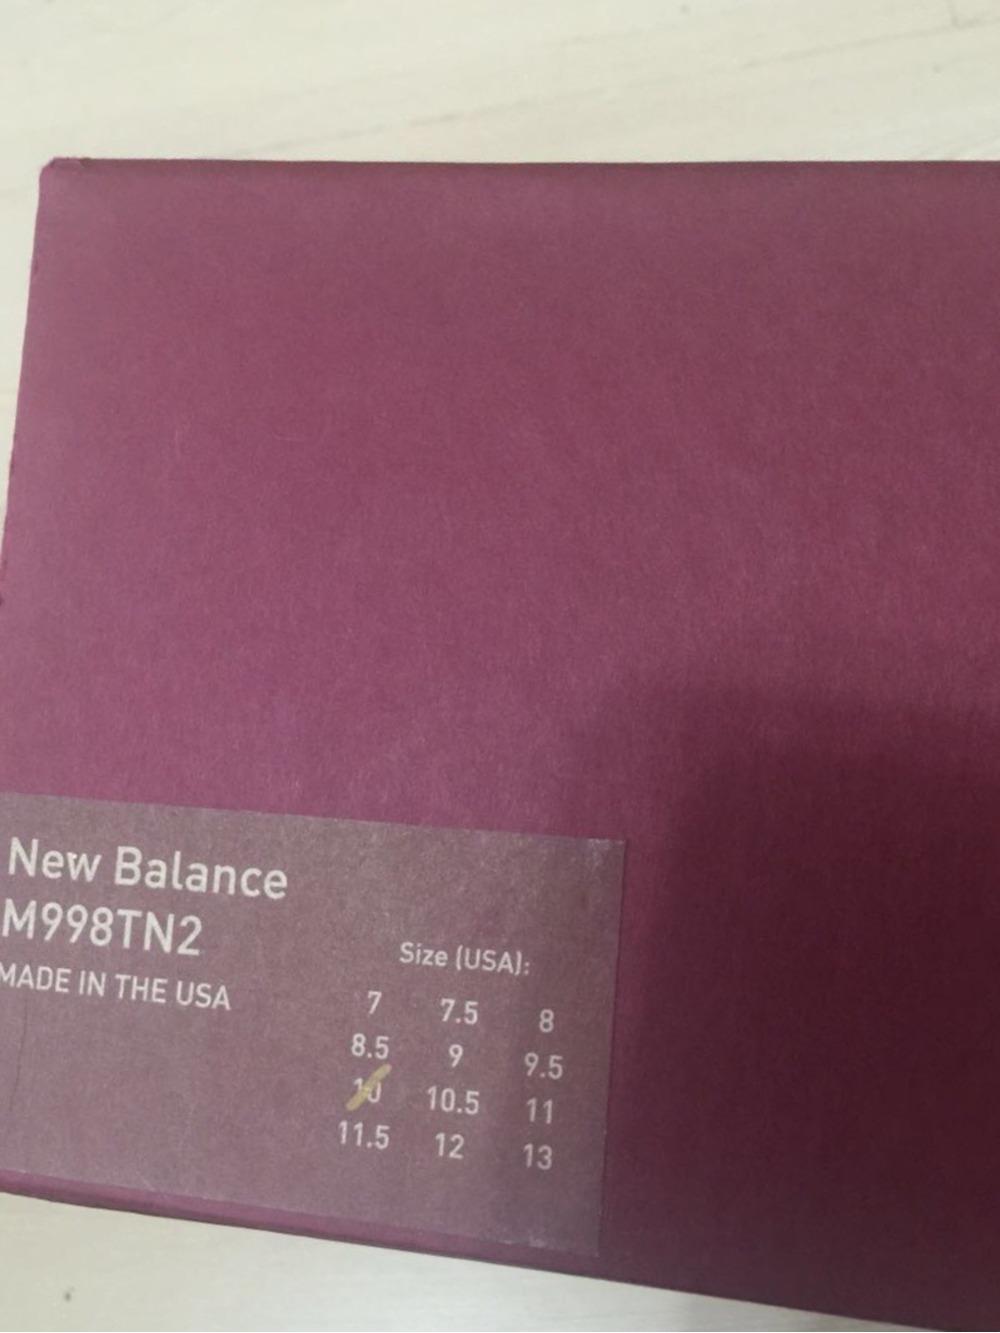 new balance 880 vs 990